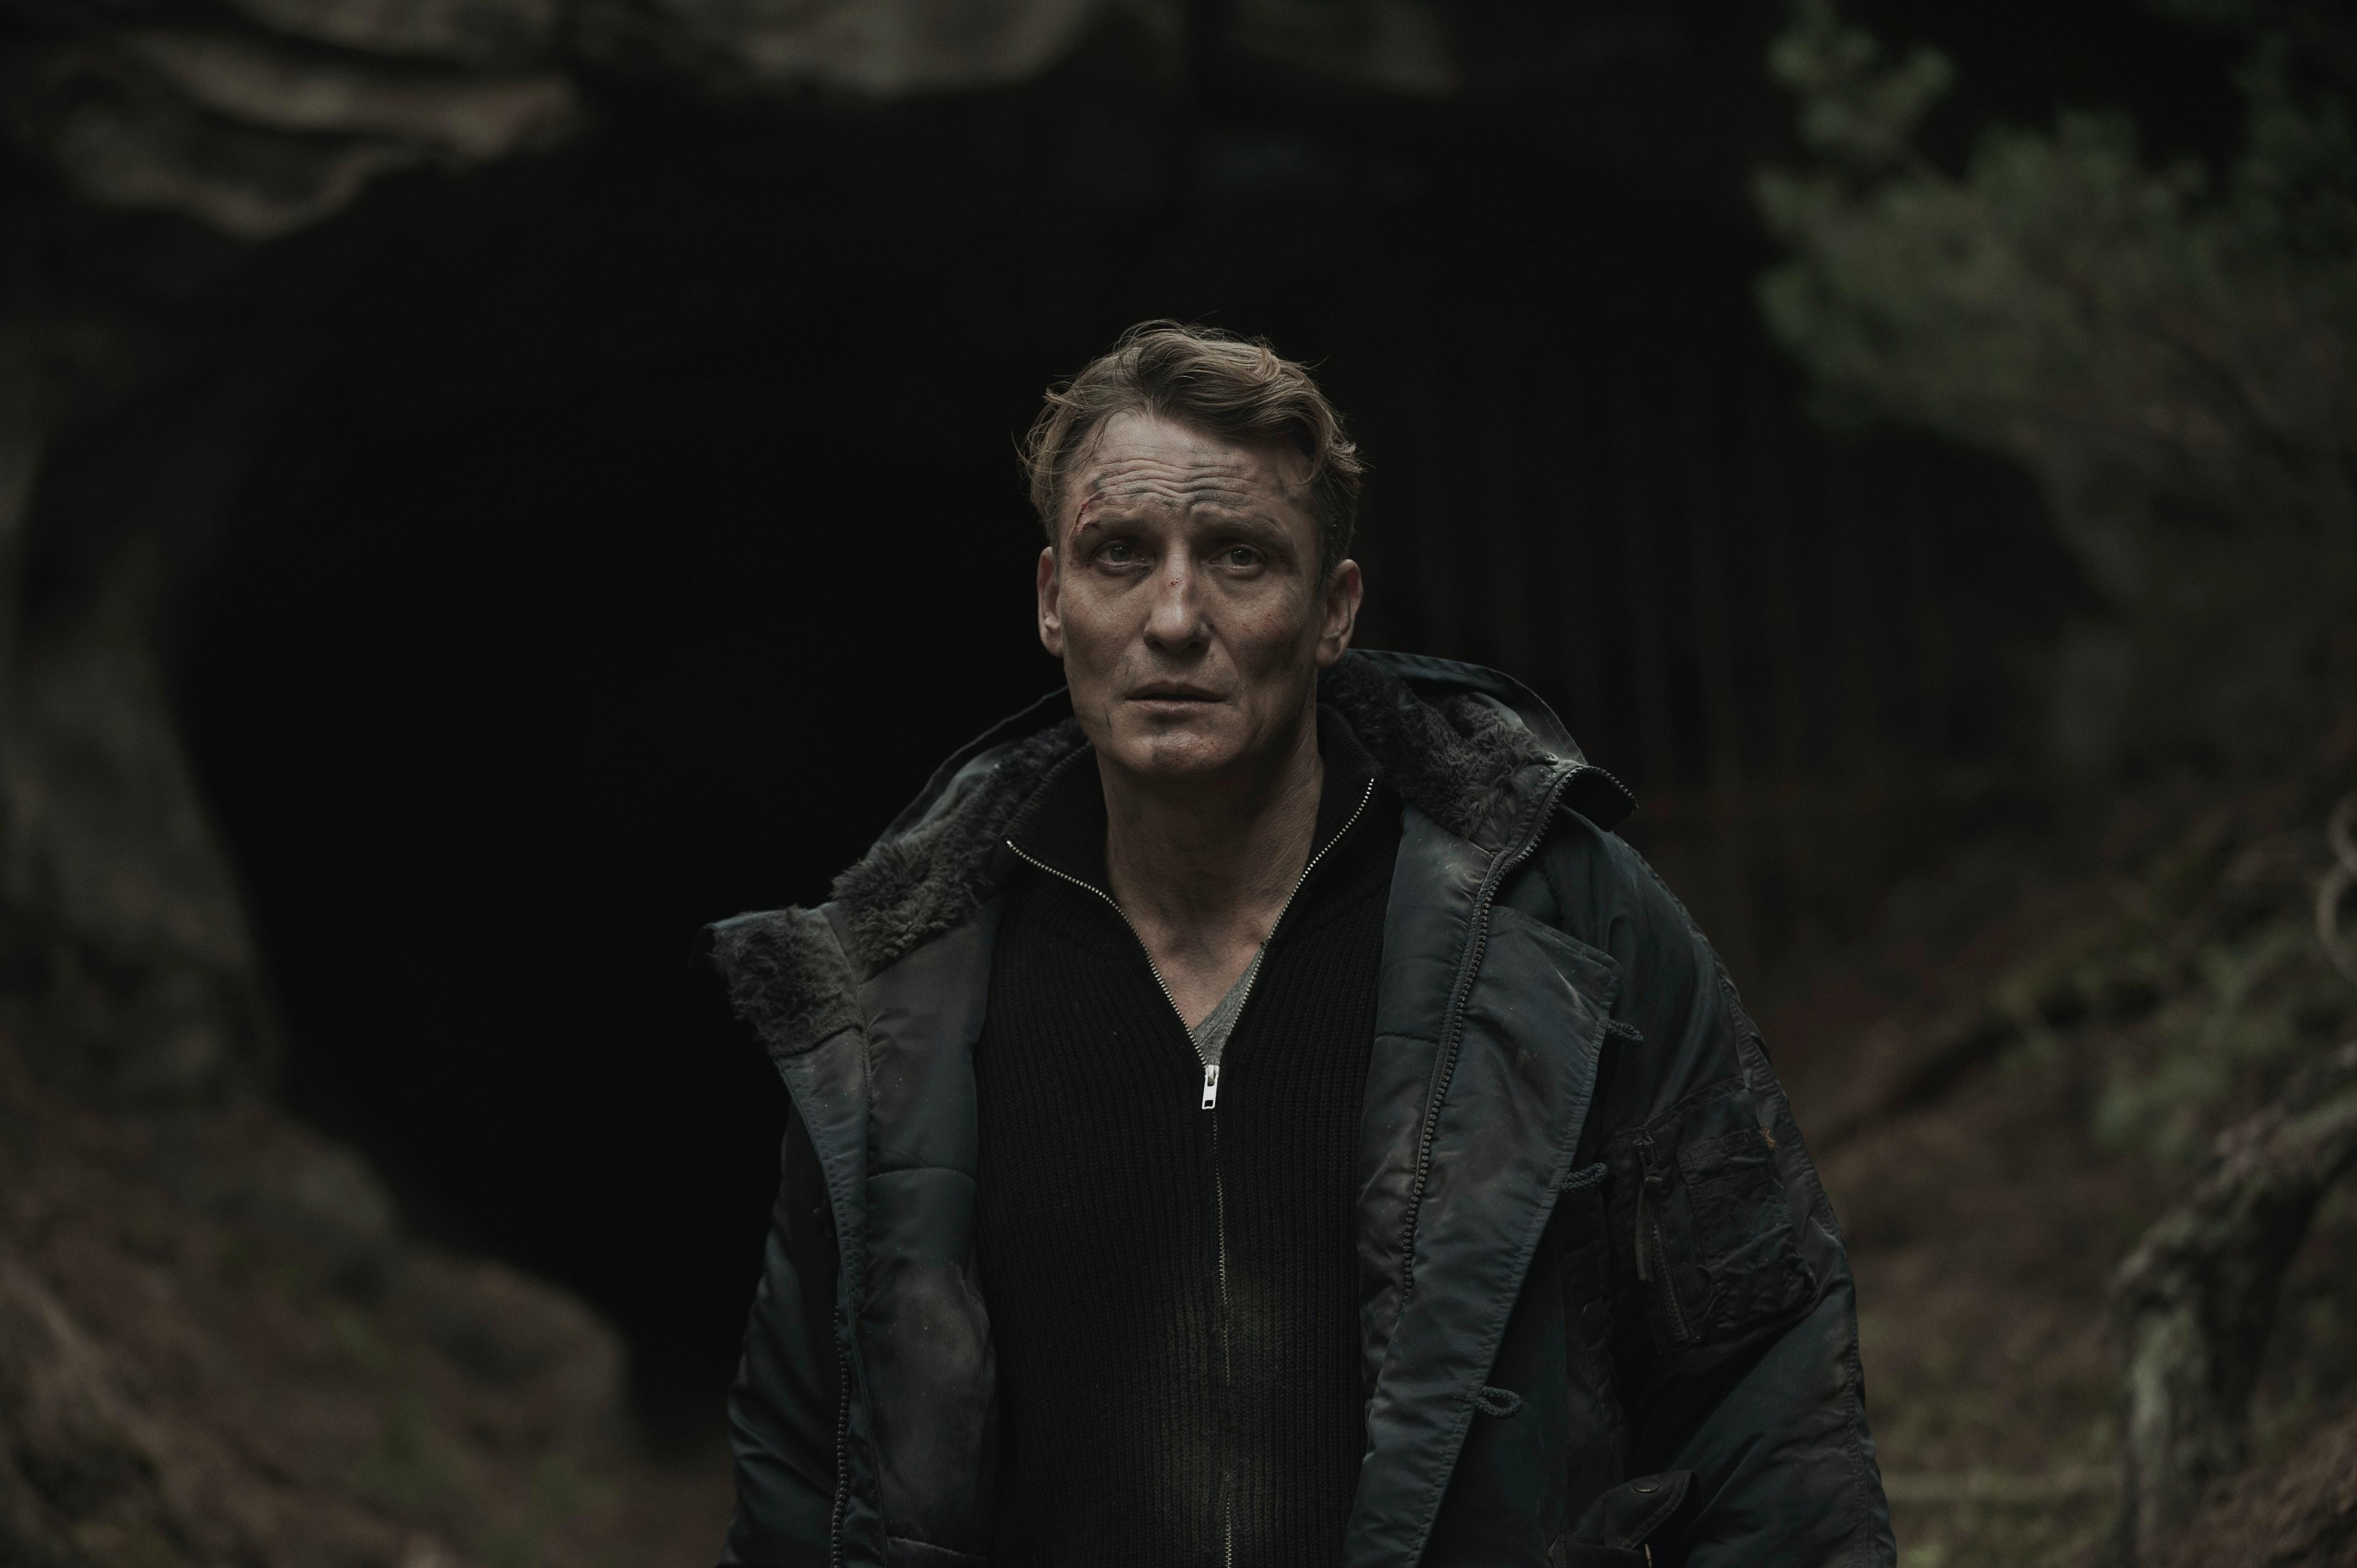 The 'Dark' Season 1 Recap You Need Before The Ultra